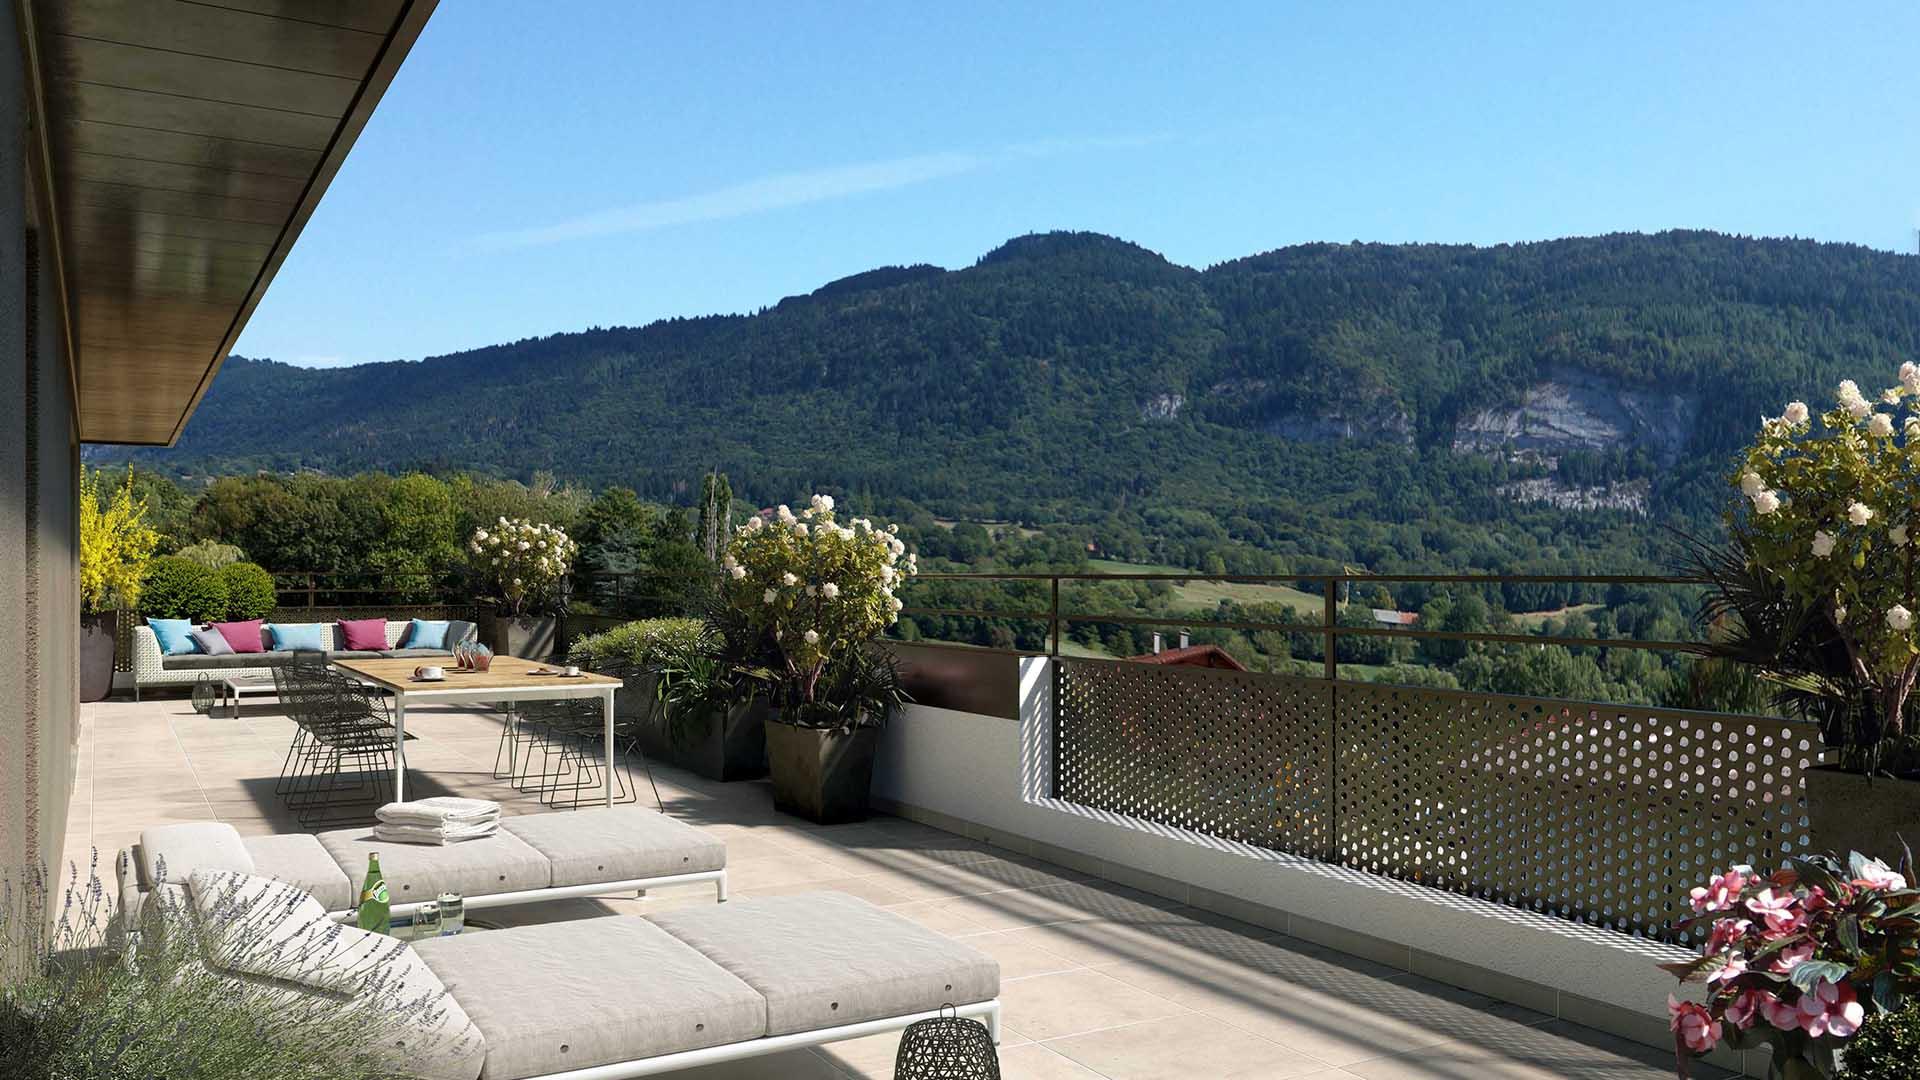 Terrasses Bellevue Programme Immobilier Neuf A Beaumont